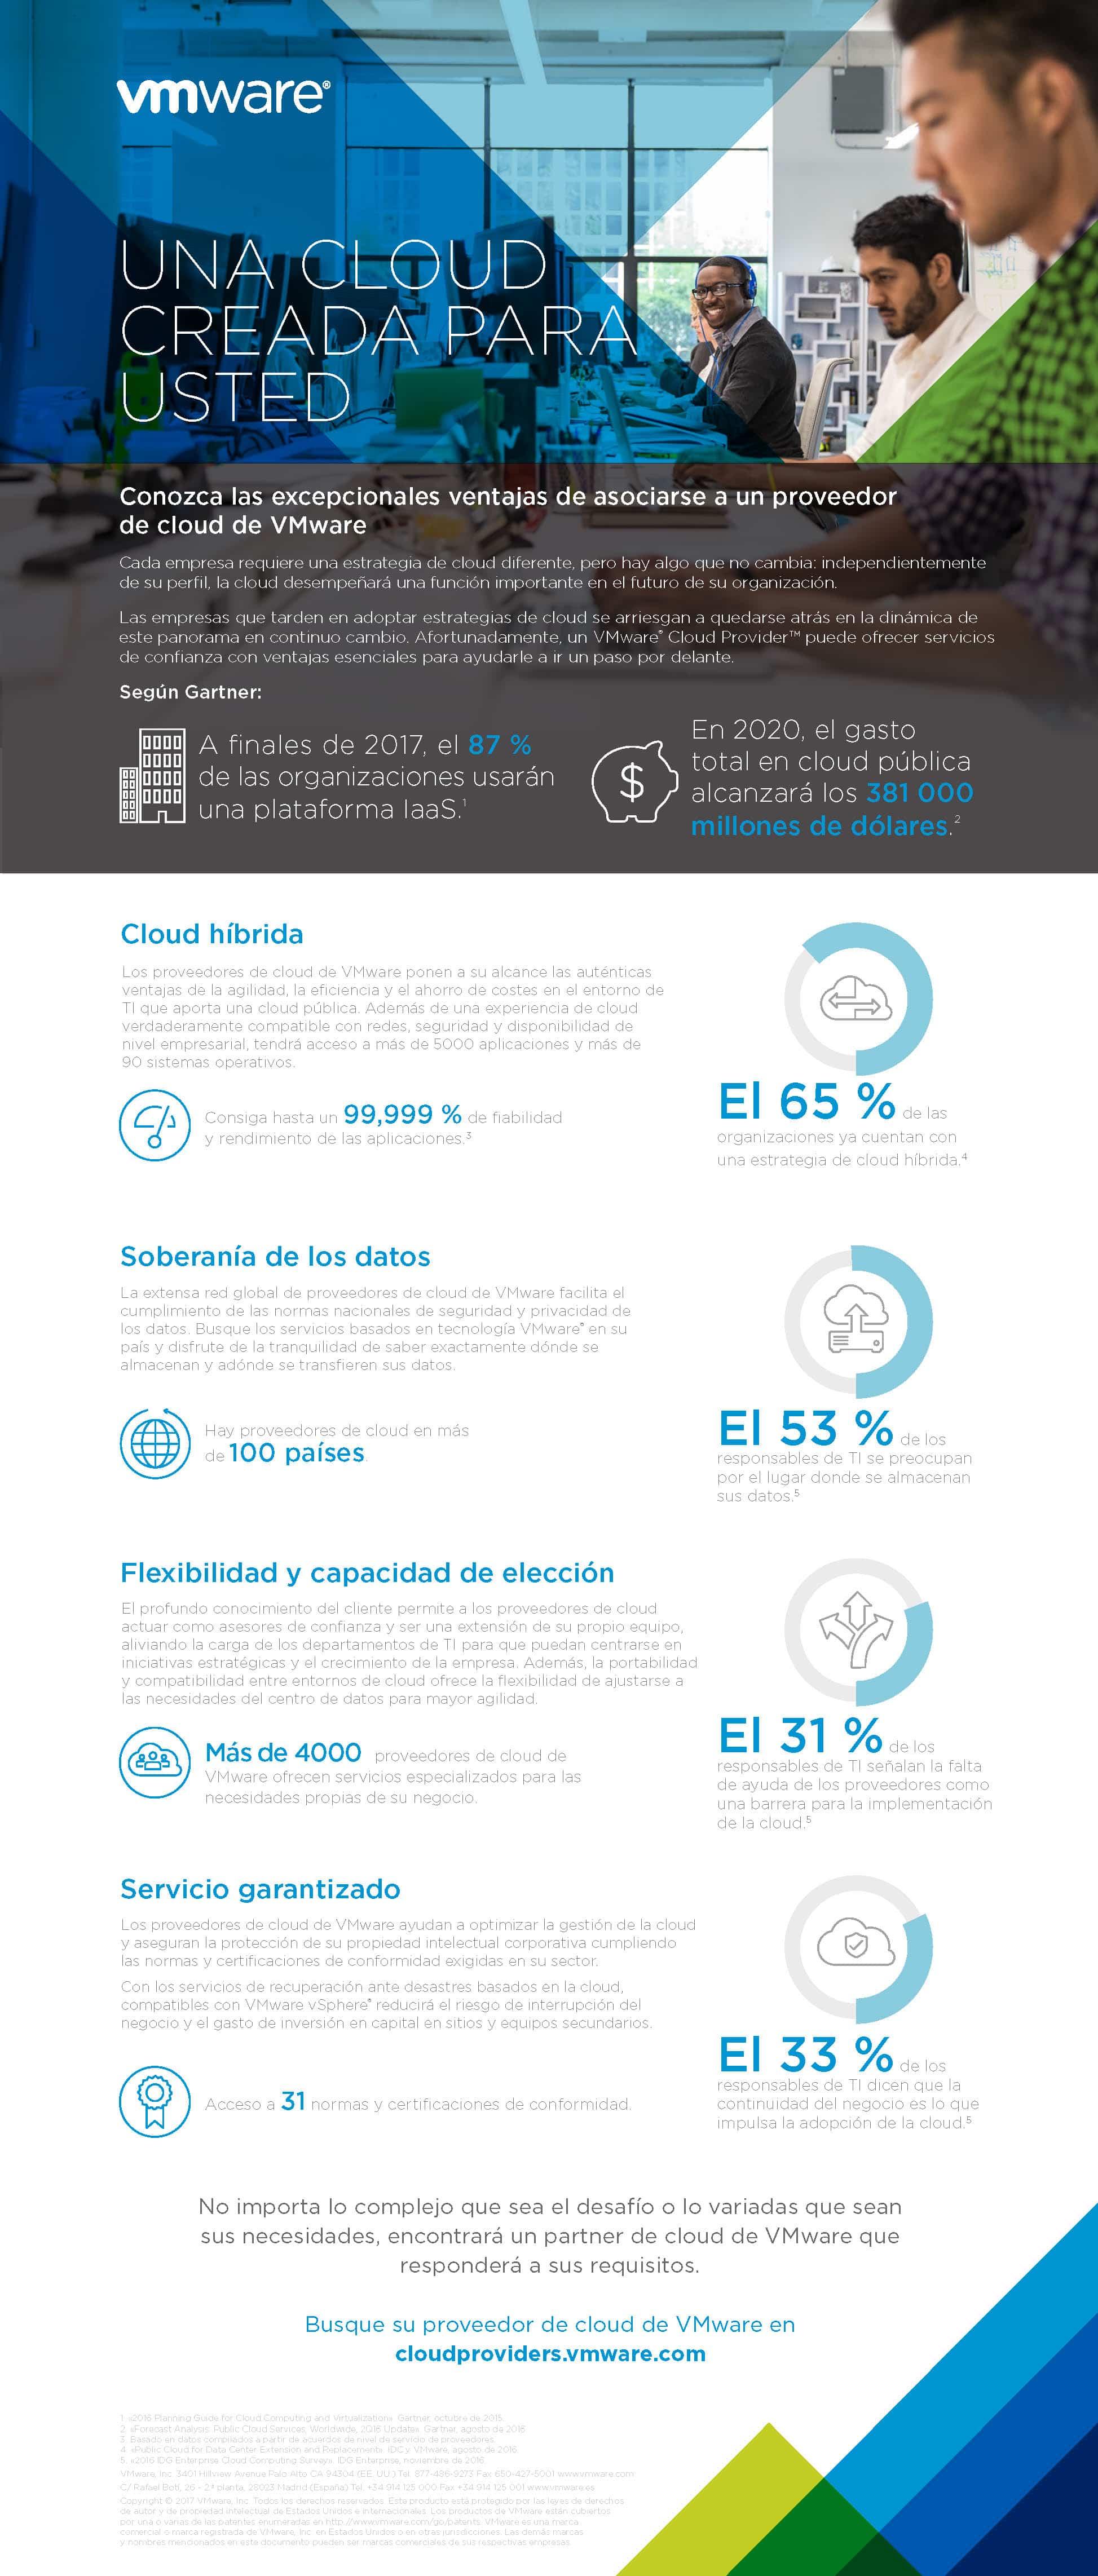 vmware cloud provider benefits es